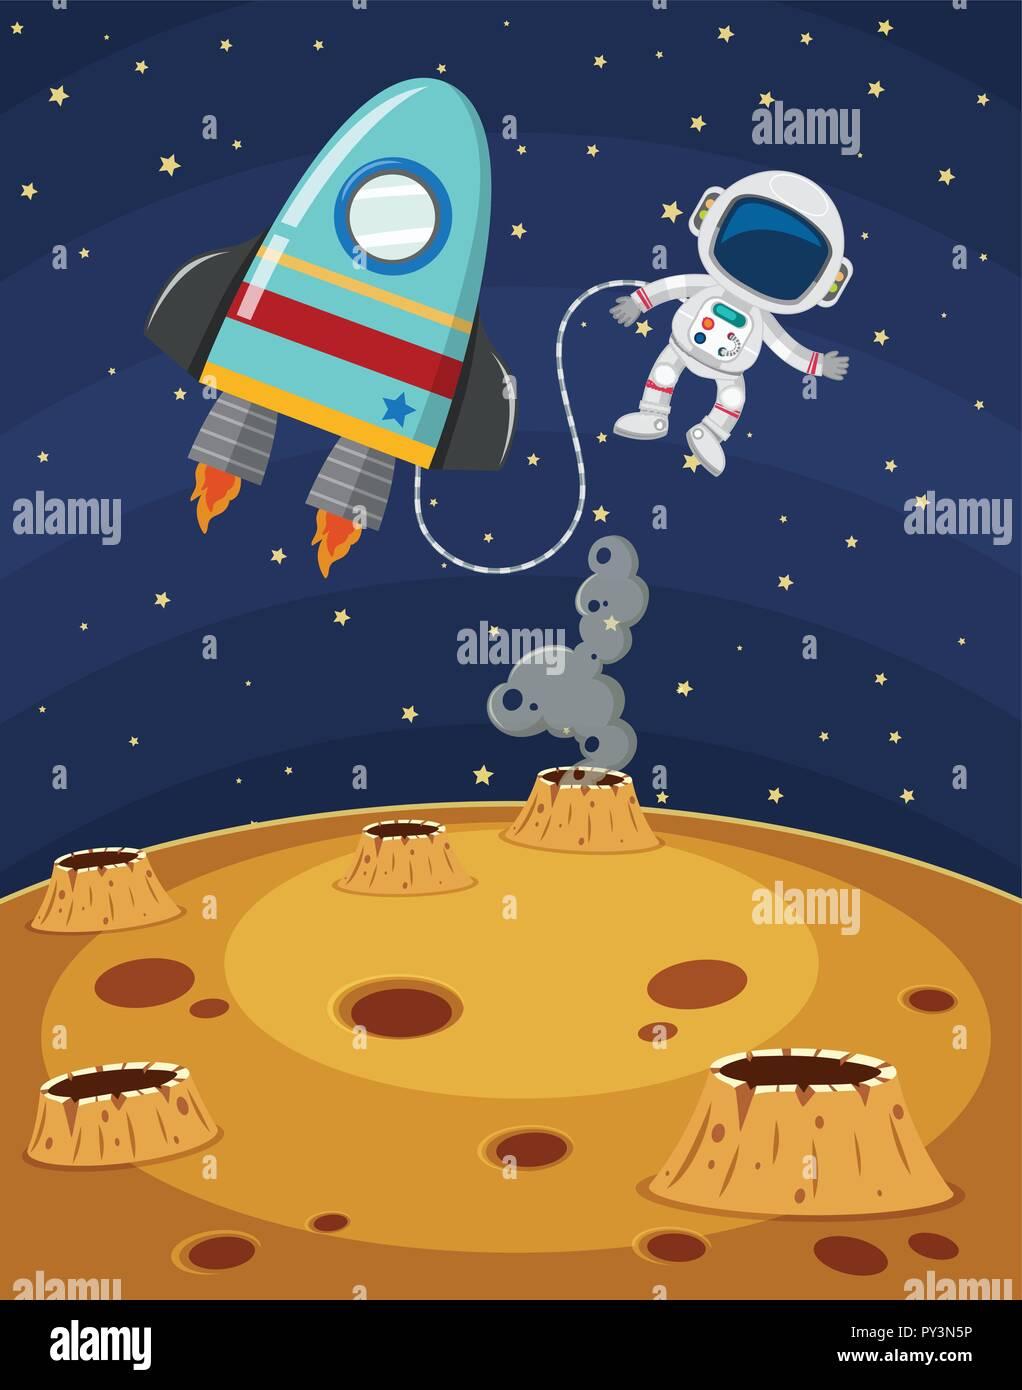 Astronaut Exploring Fantasy Planet Surface illustration - Stock Vector